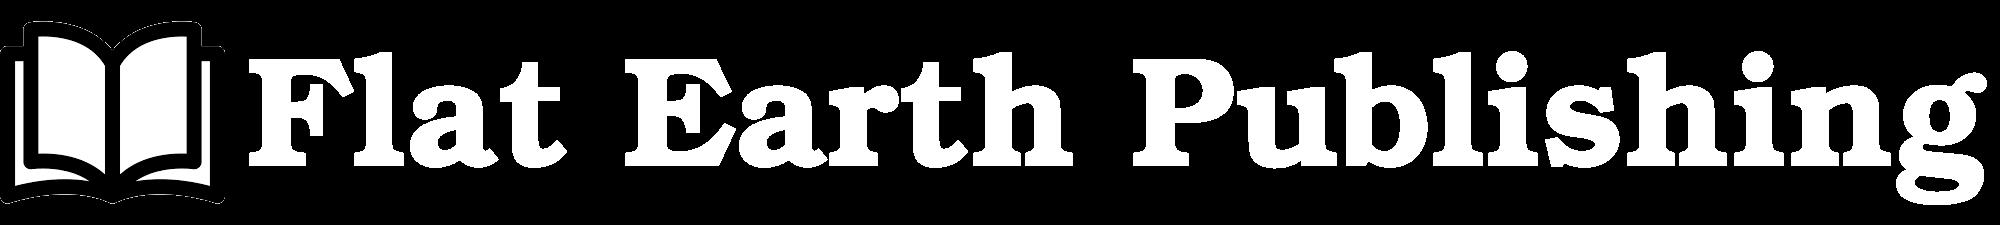 Flat Earth Publishing